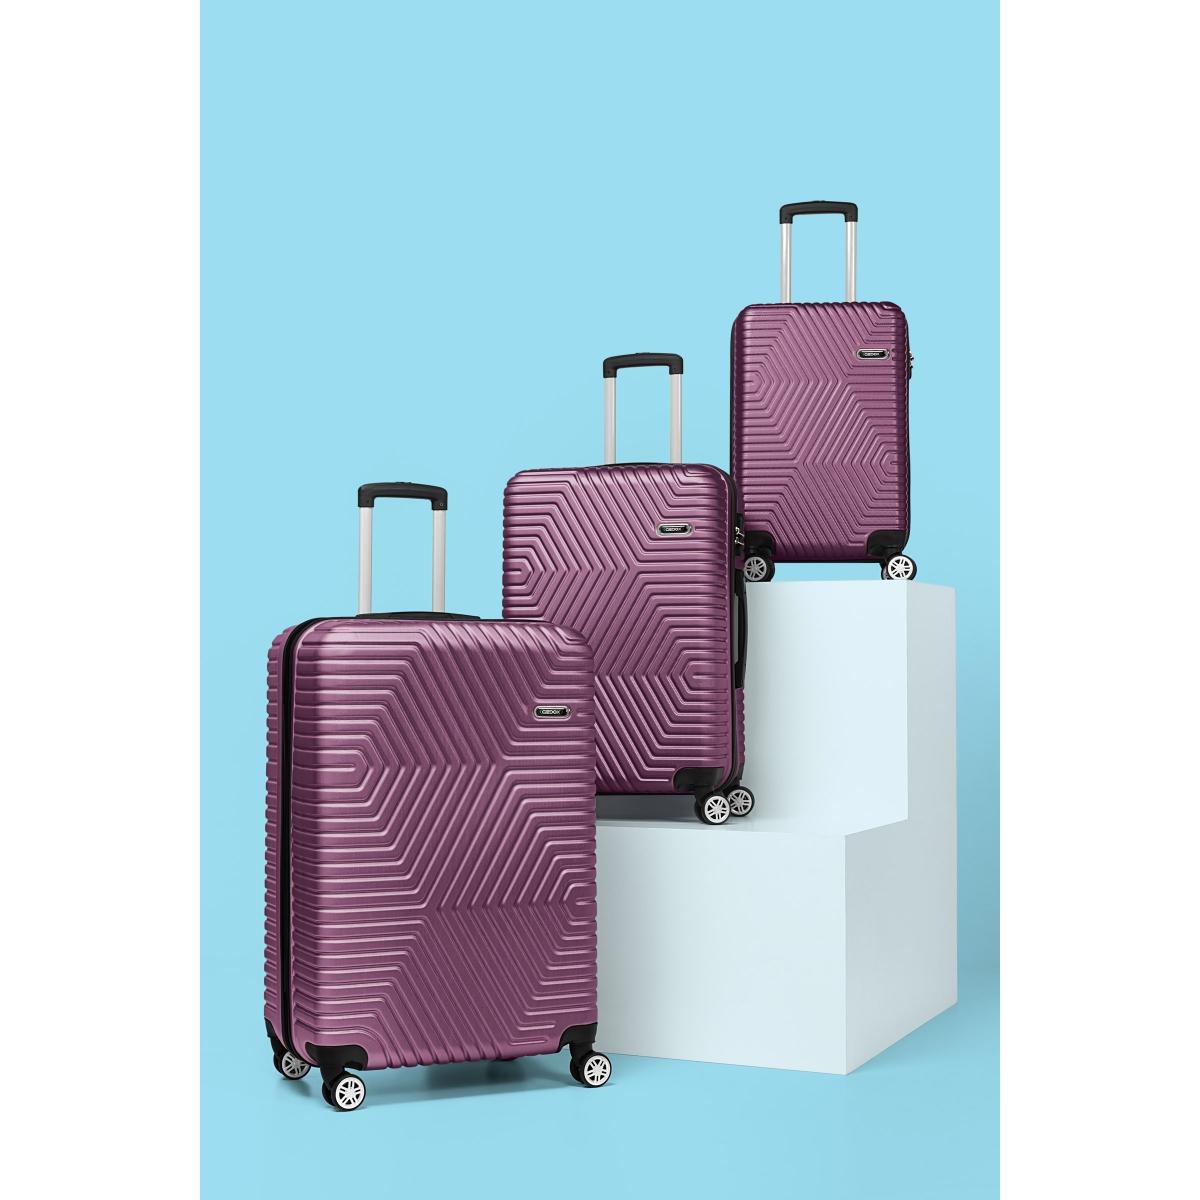 G&D Polo Suitcase ABS 3'lü Lüx Valiz Seyahat Seti - Model:600.09 Mürdüm